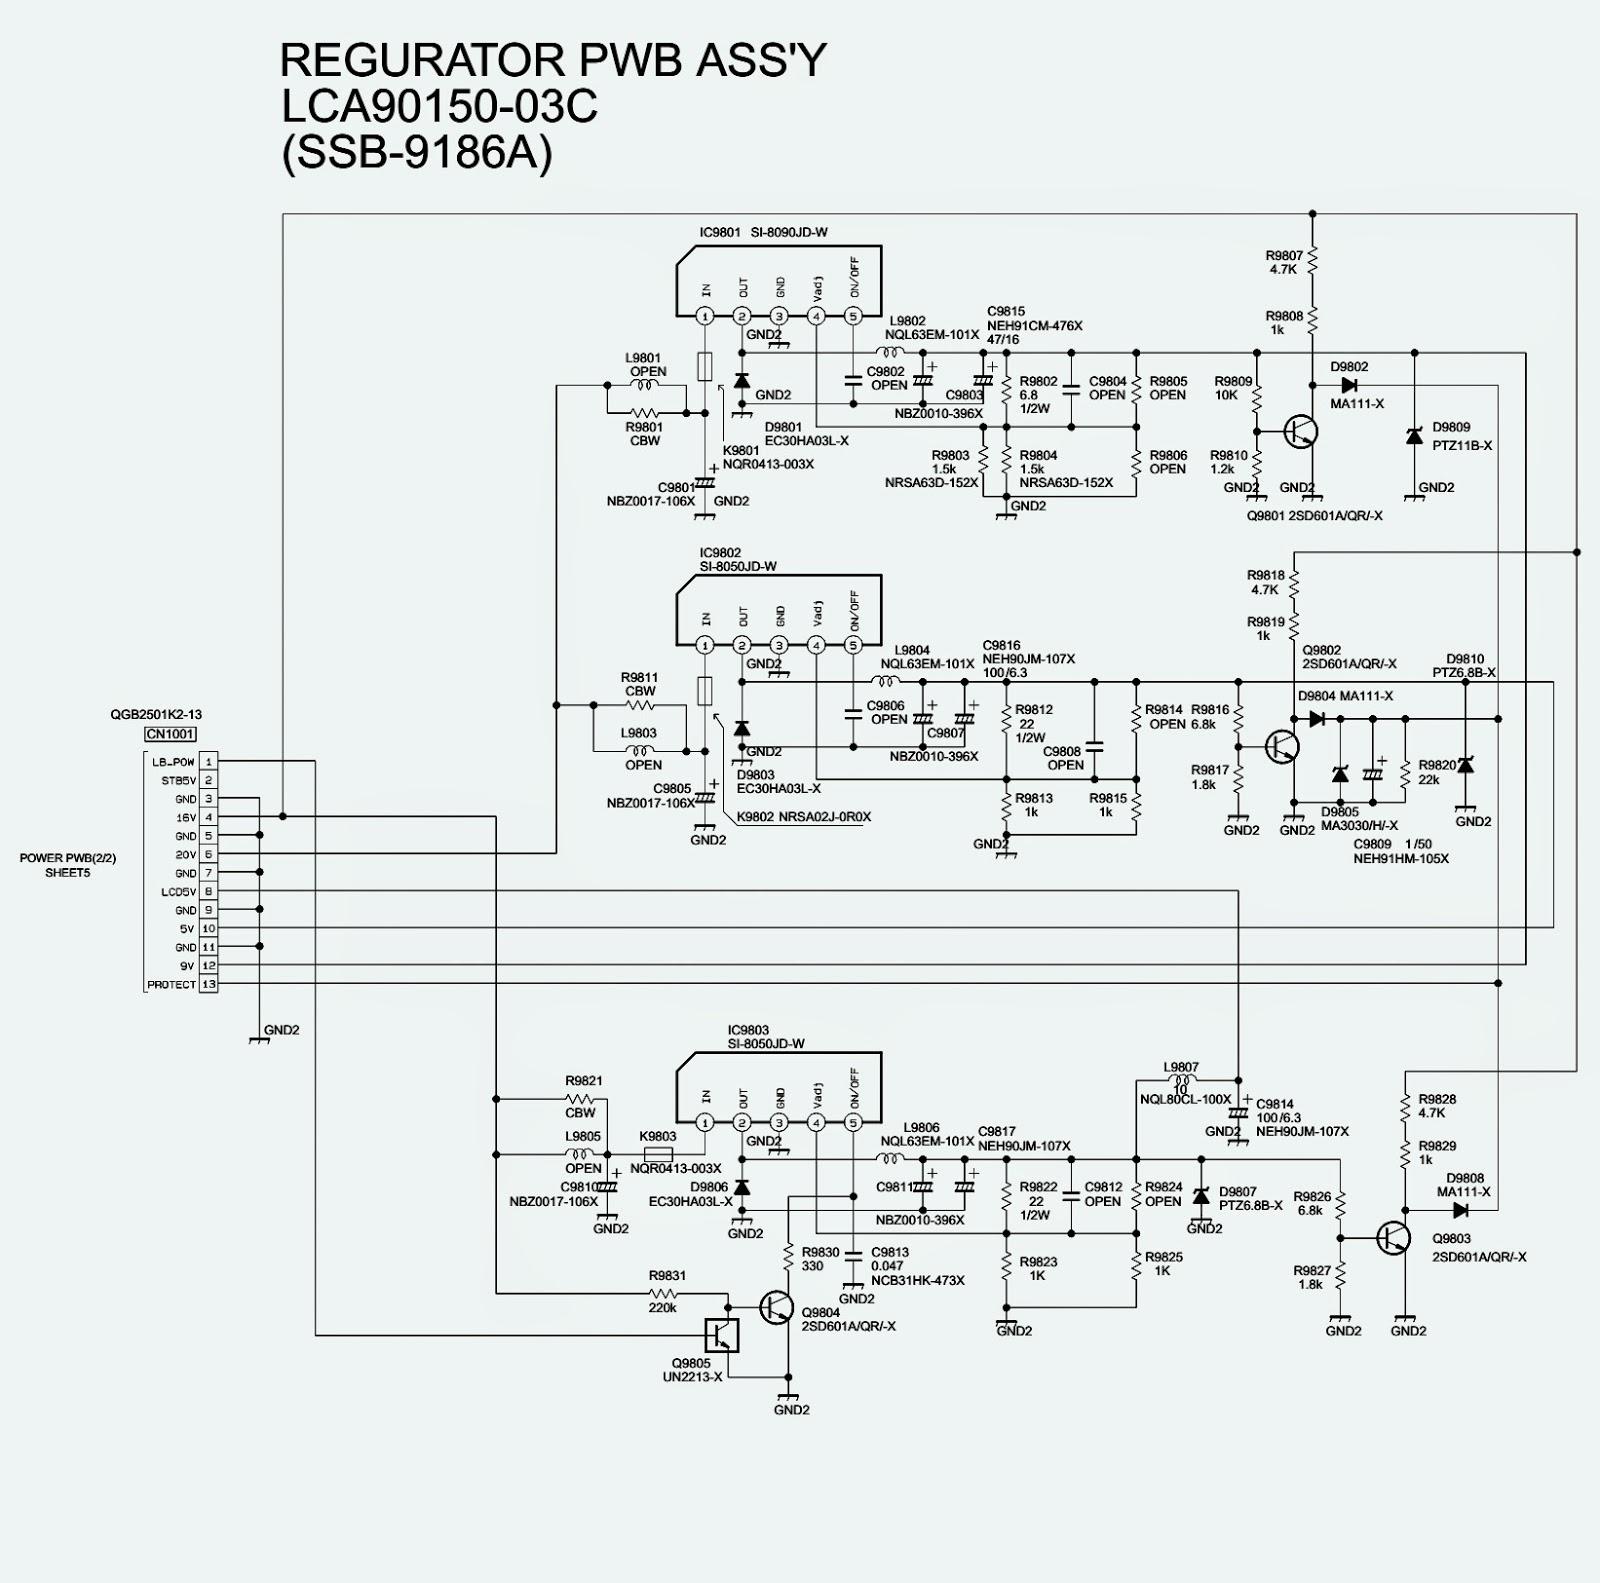 circuit diagram jvc tv jvc lt26wx84/t – lcd flat tv – power supply regulator ... crt tv circuit diagram